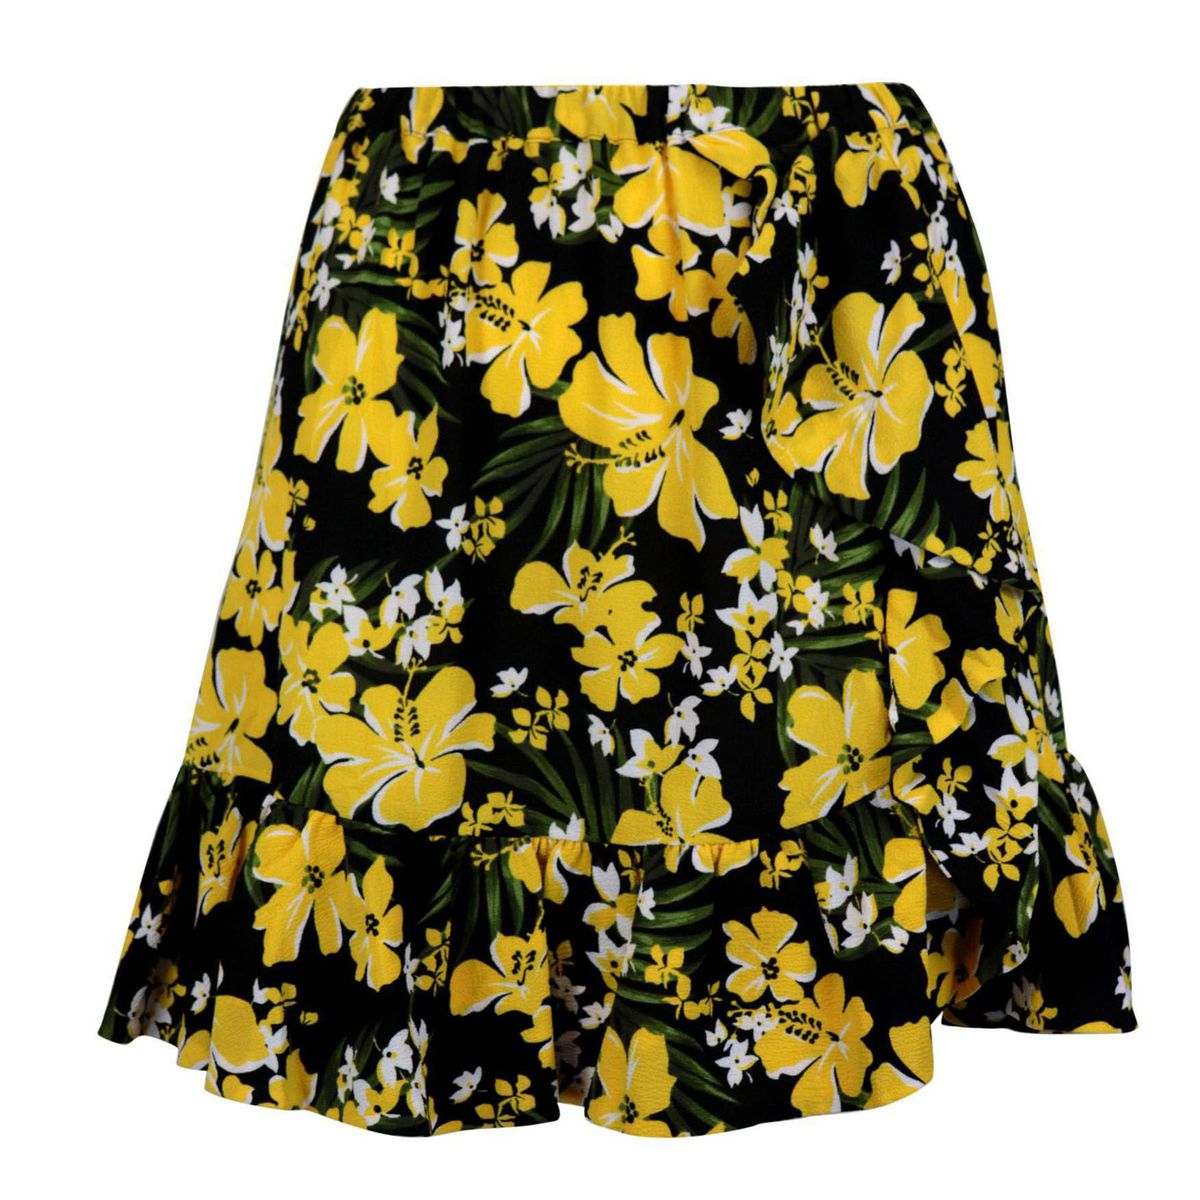 Patterned georgette skirt Yellow black Michael Kors